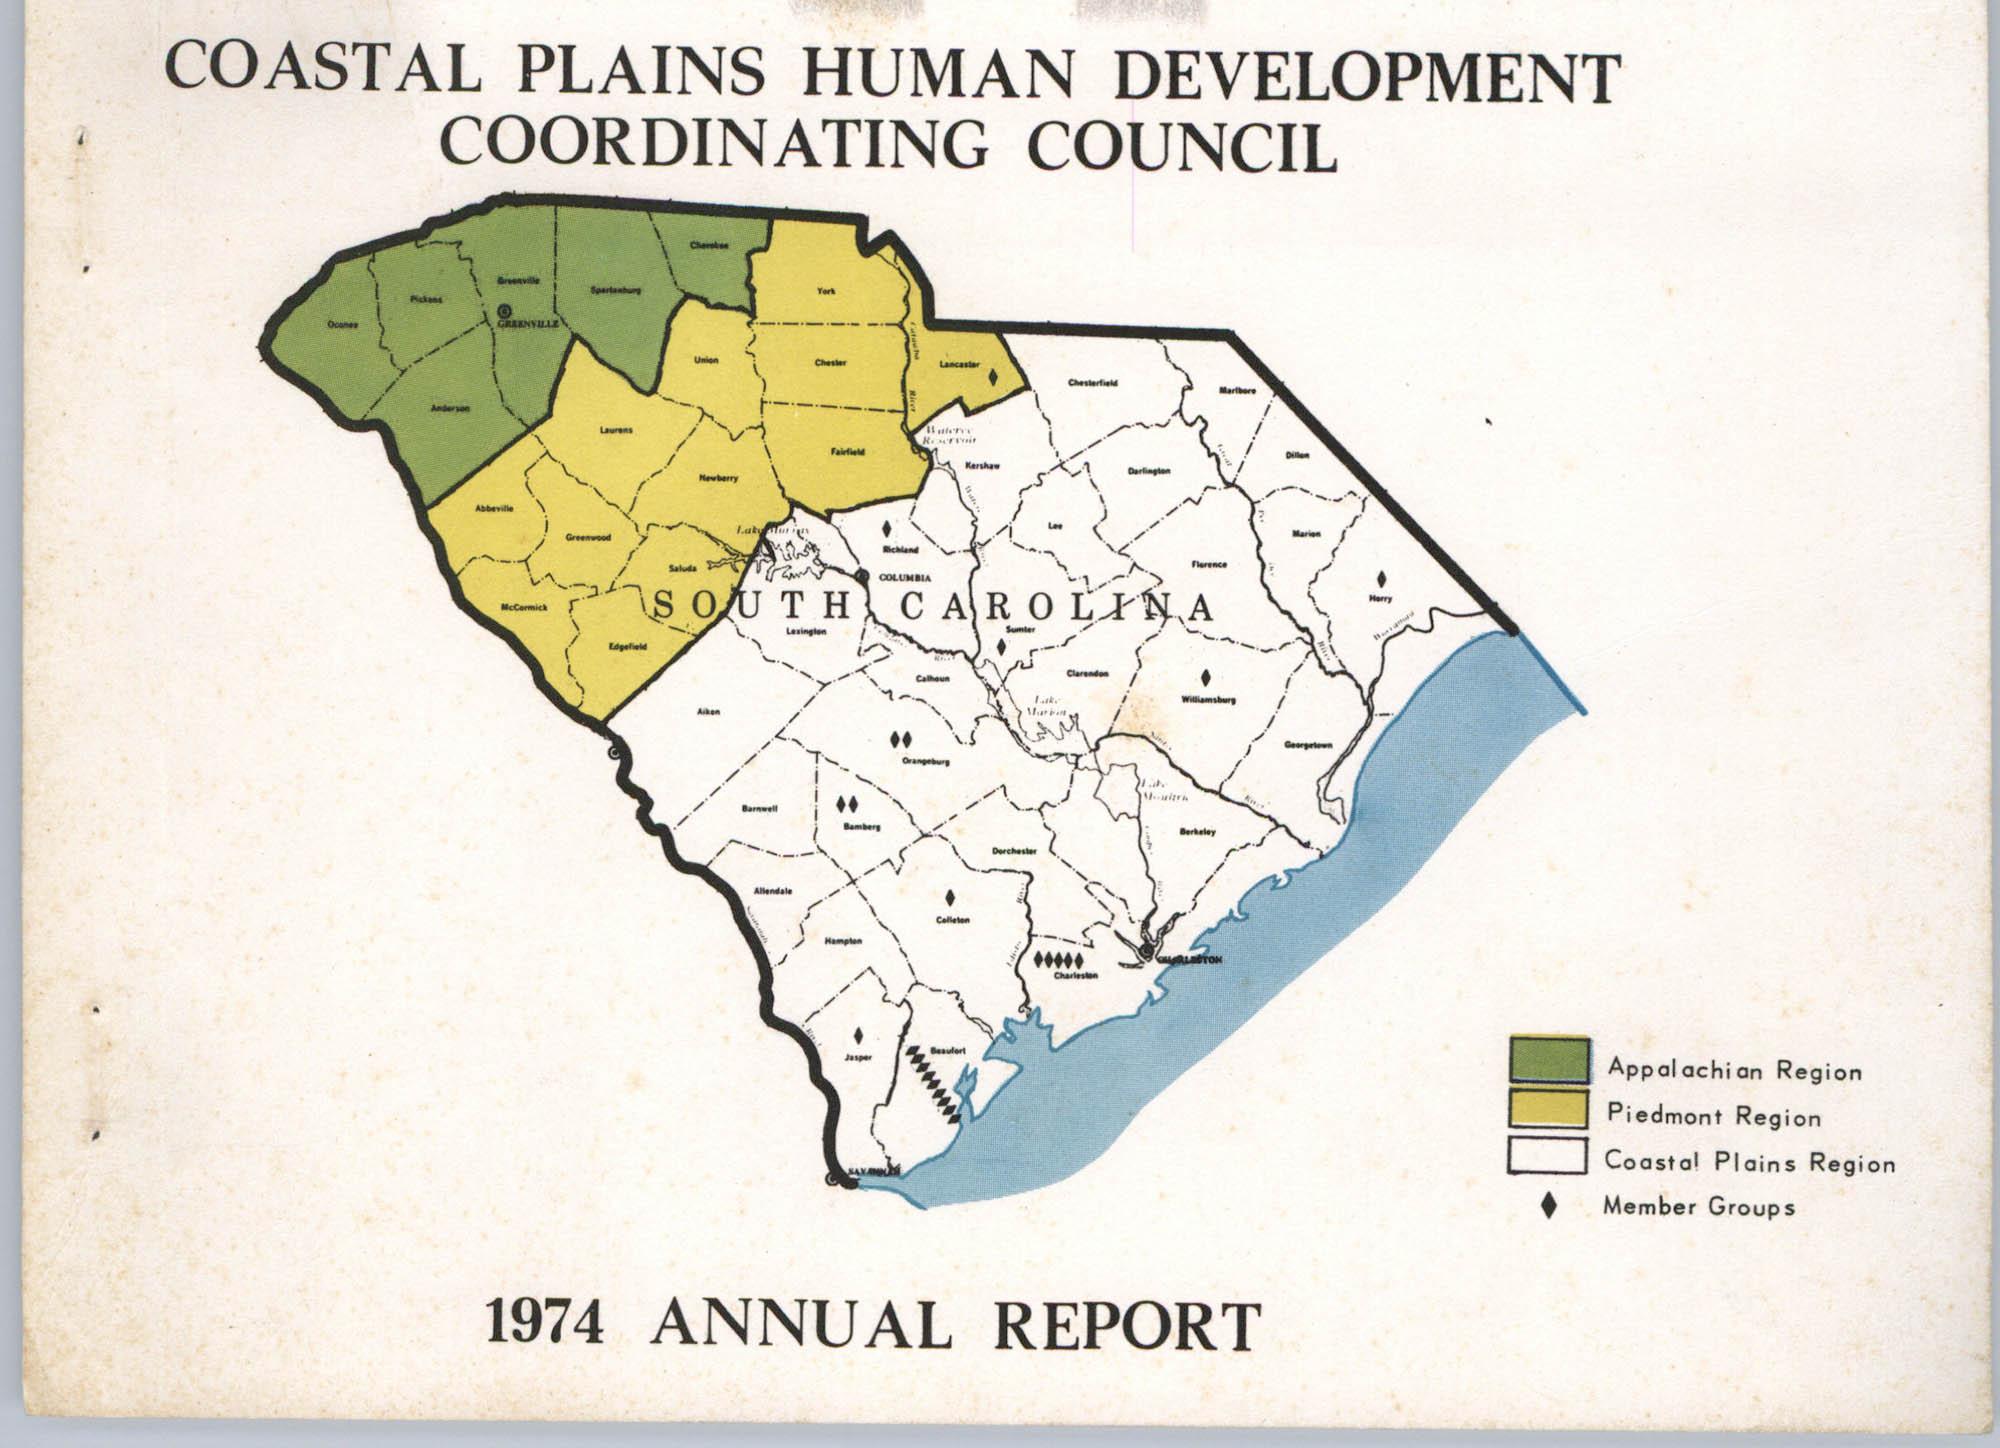 Coastal Plains Human Development Coordinating Council, 1974 Annual Report